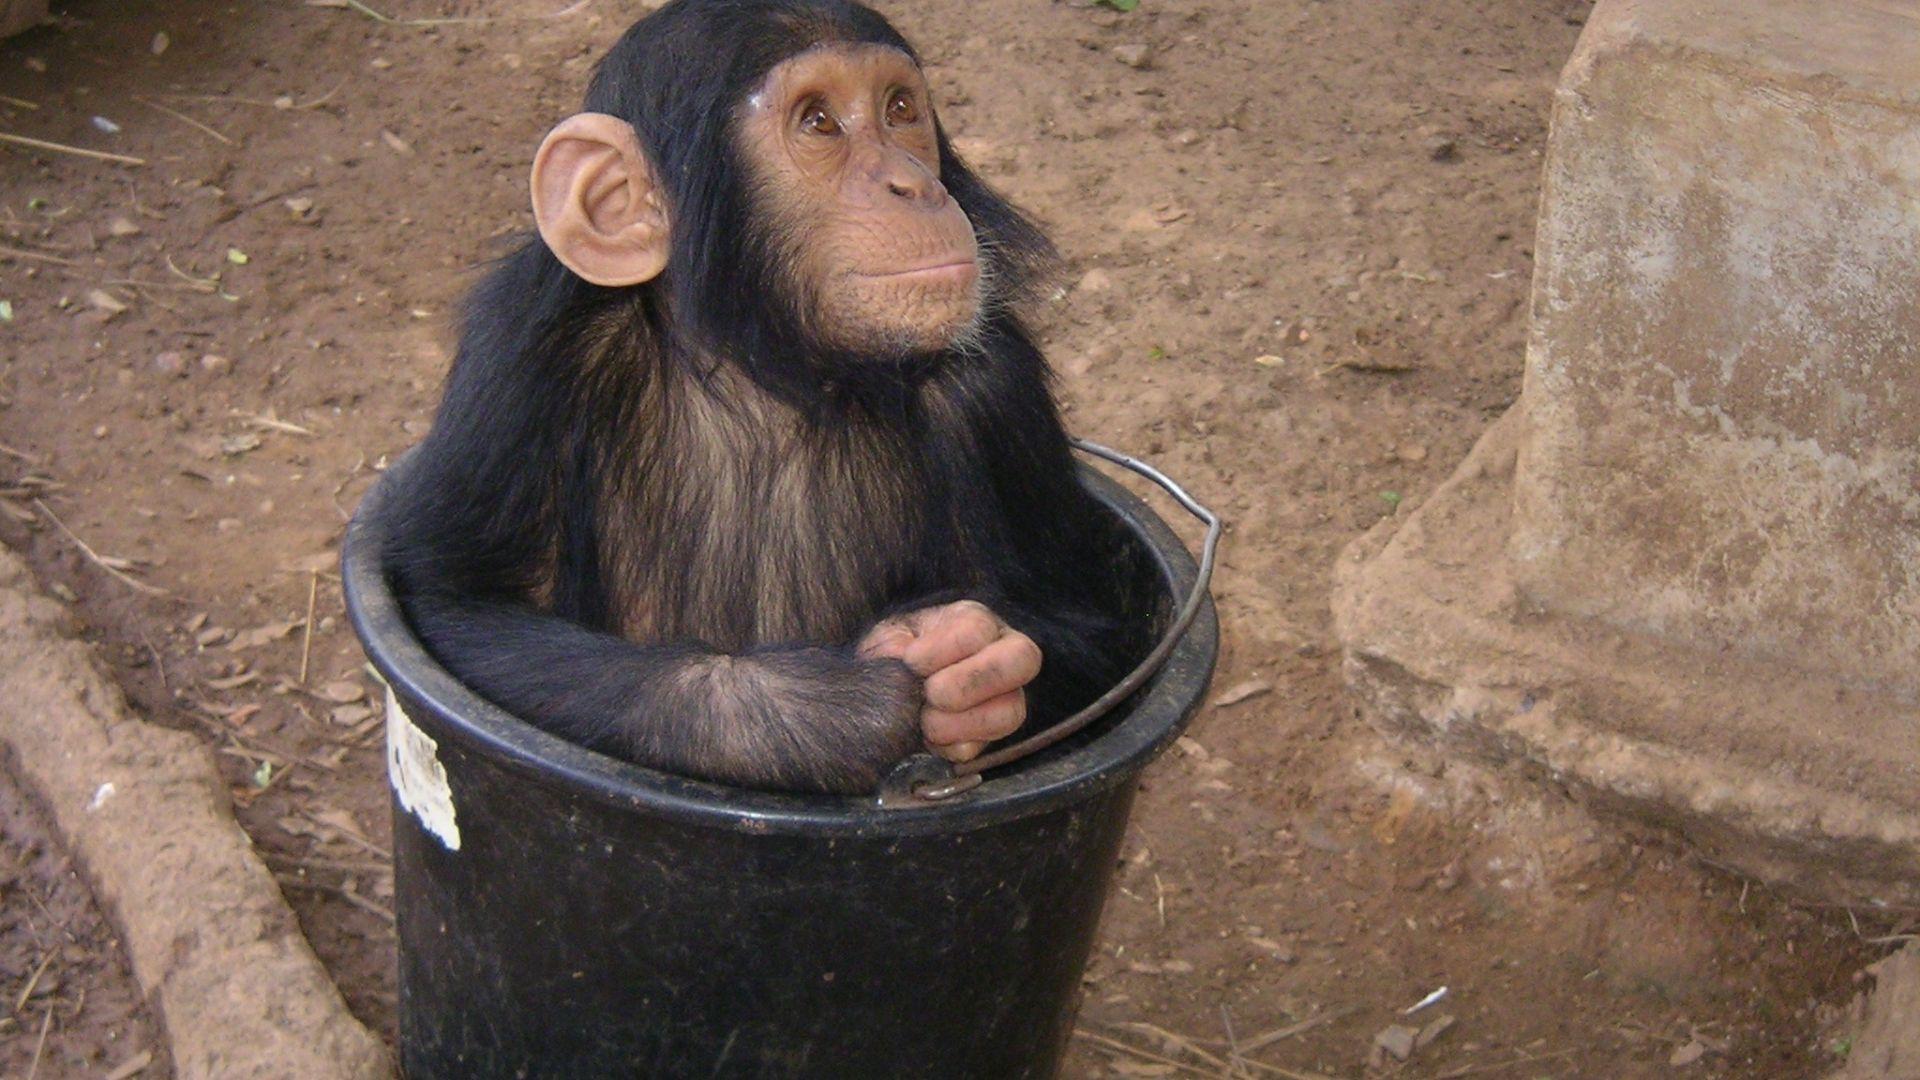 Wallpaper Monkey, animal, in bucket, play